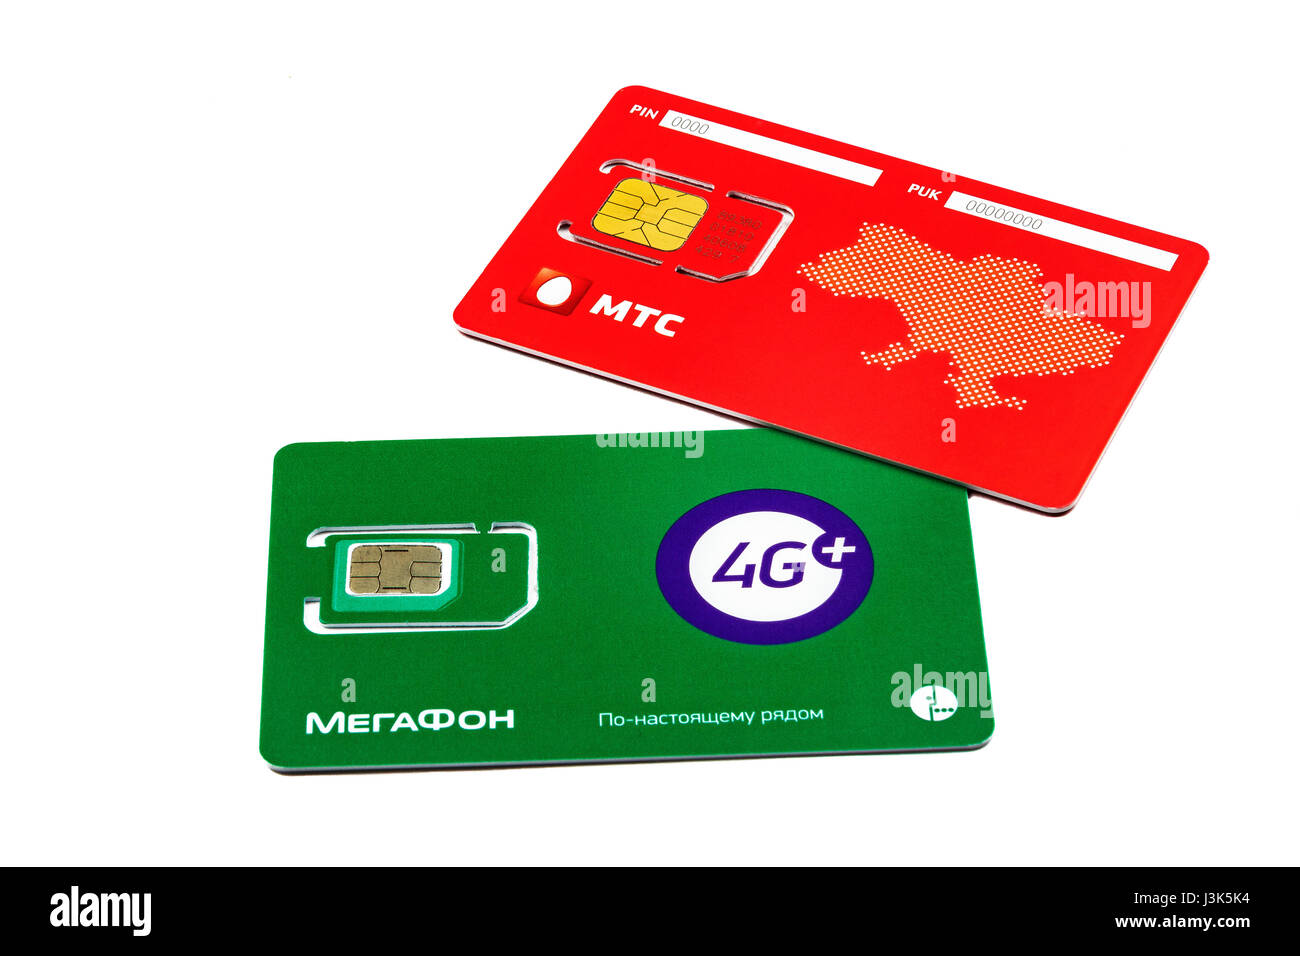 How to block a sim card Megaphone 77